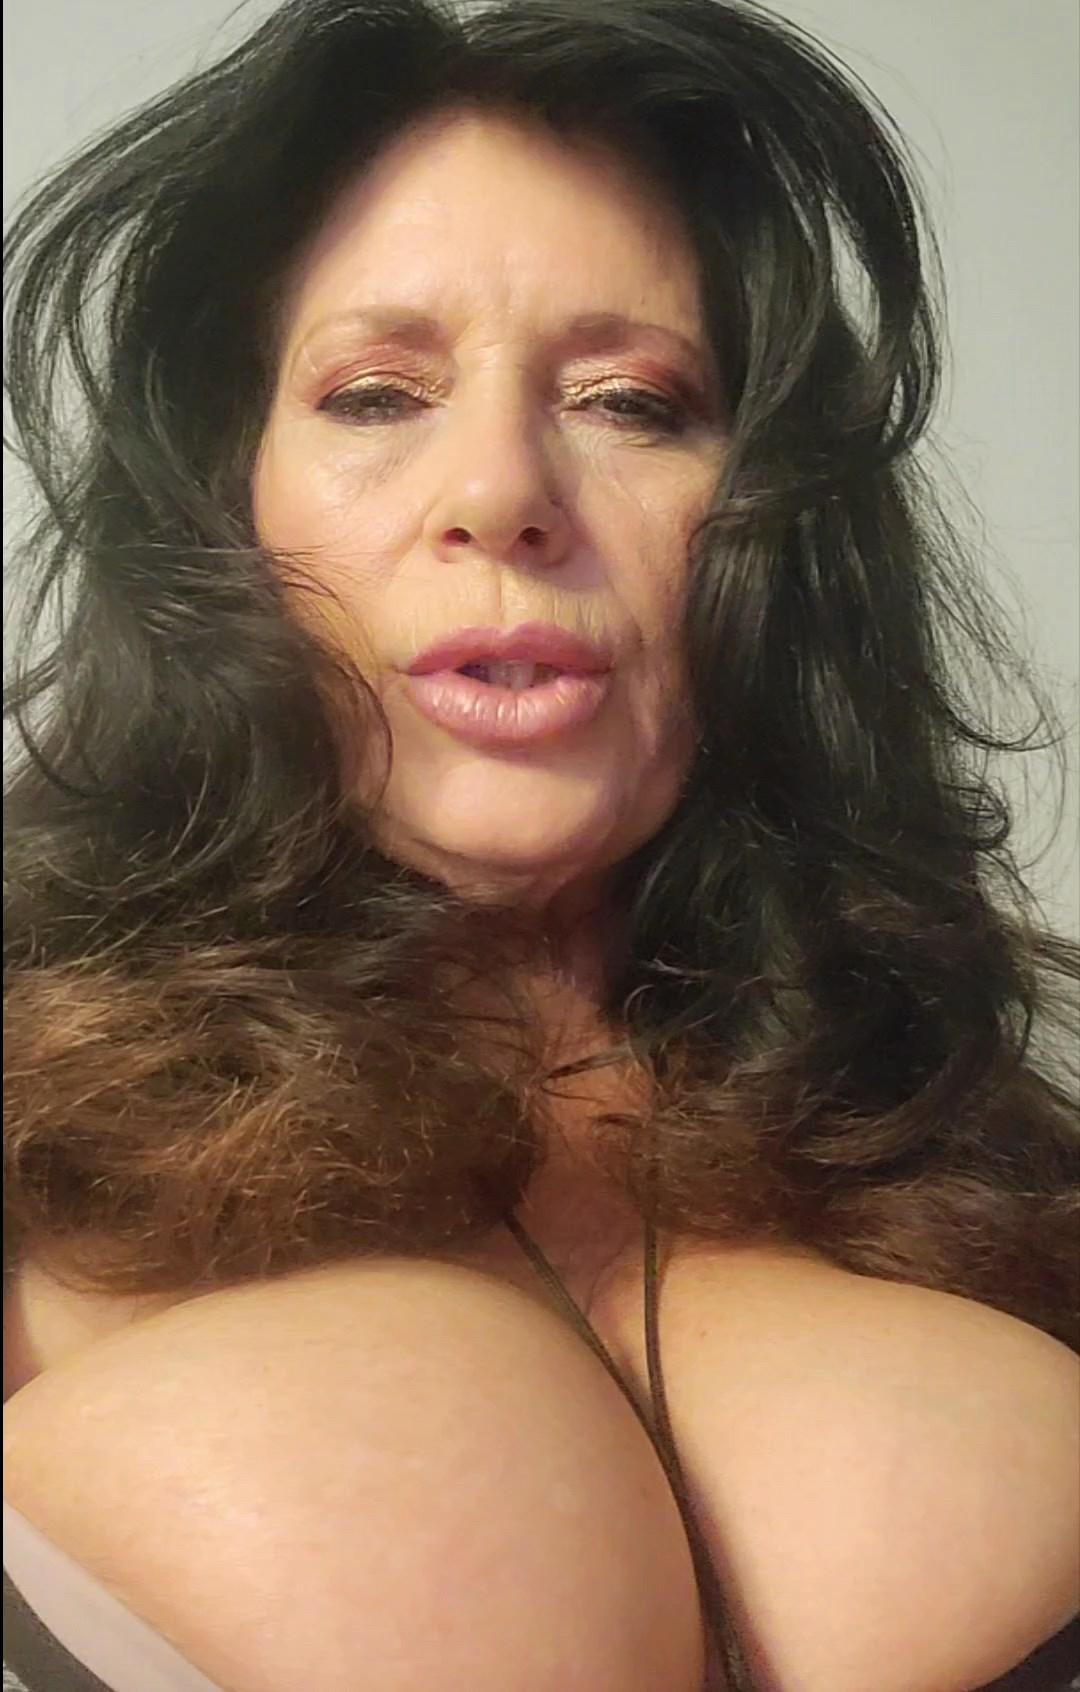 Idratherbenaughty - Mature Mom Shrinks Your GF then Eats Her